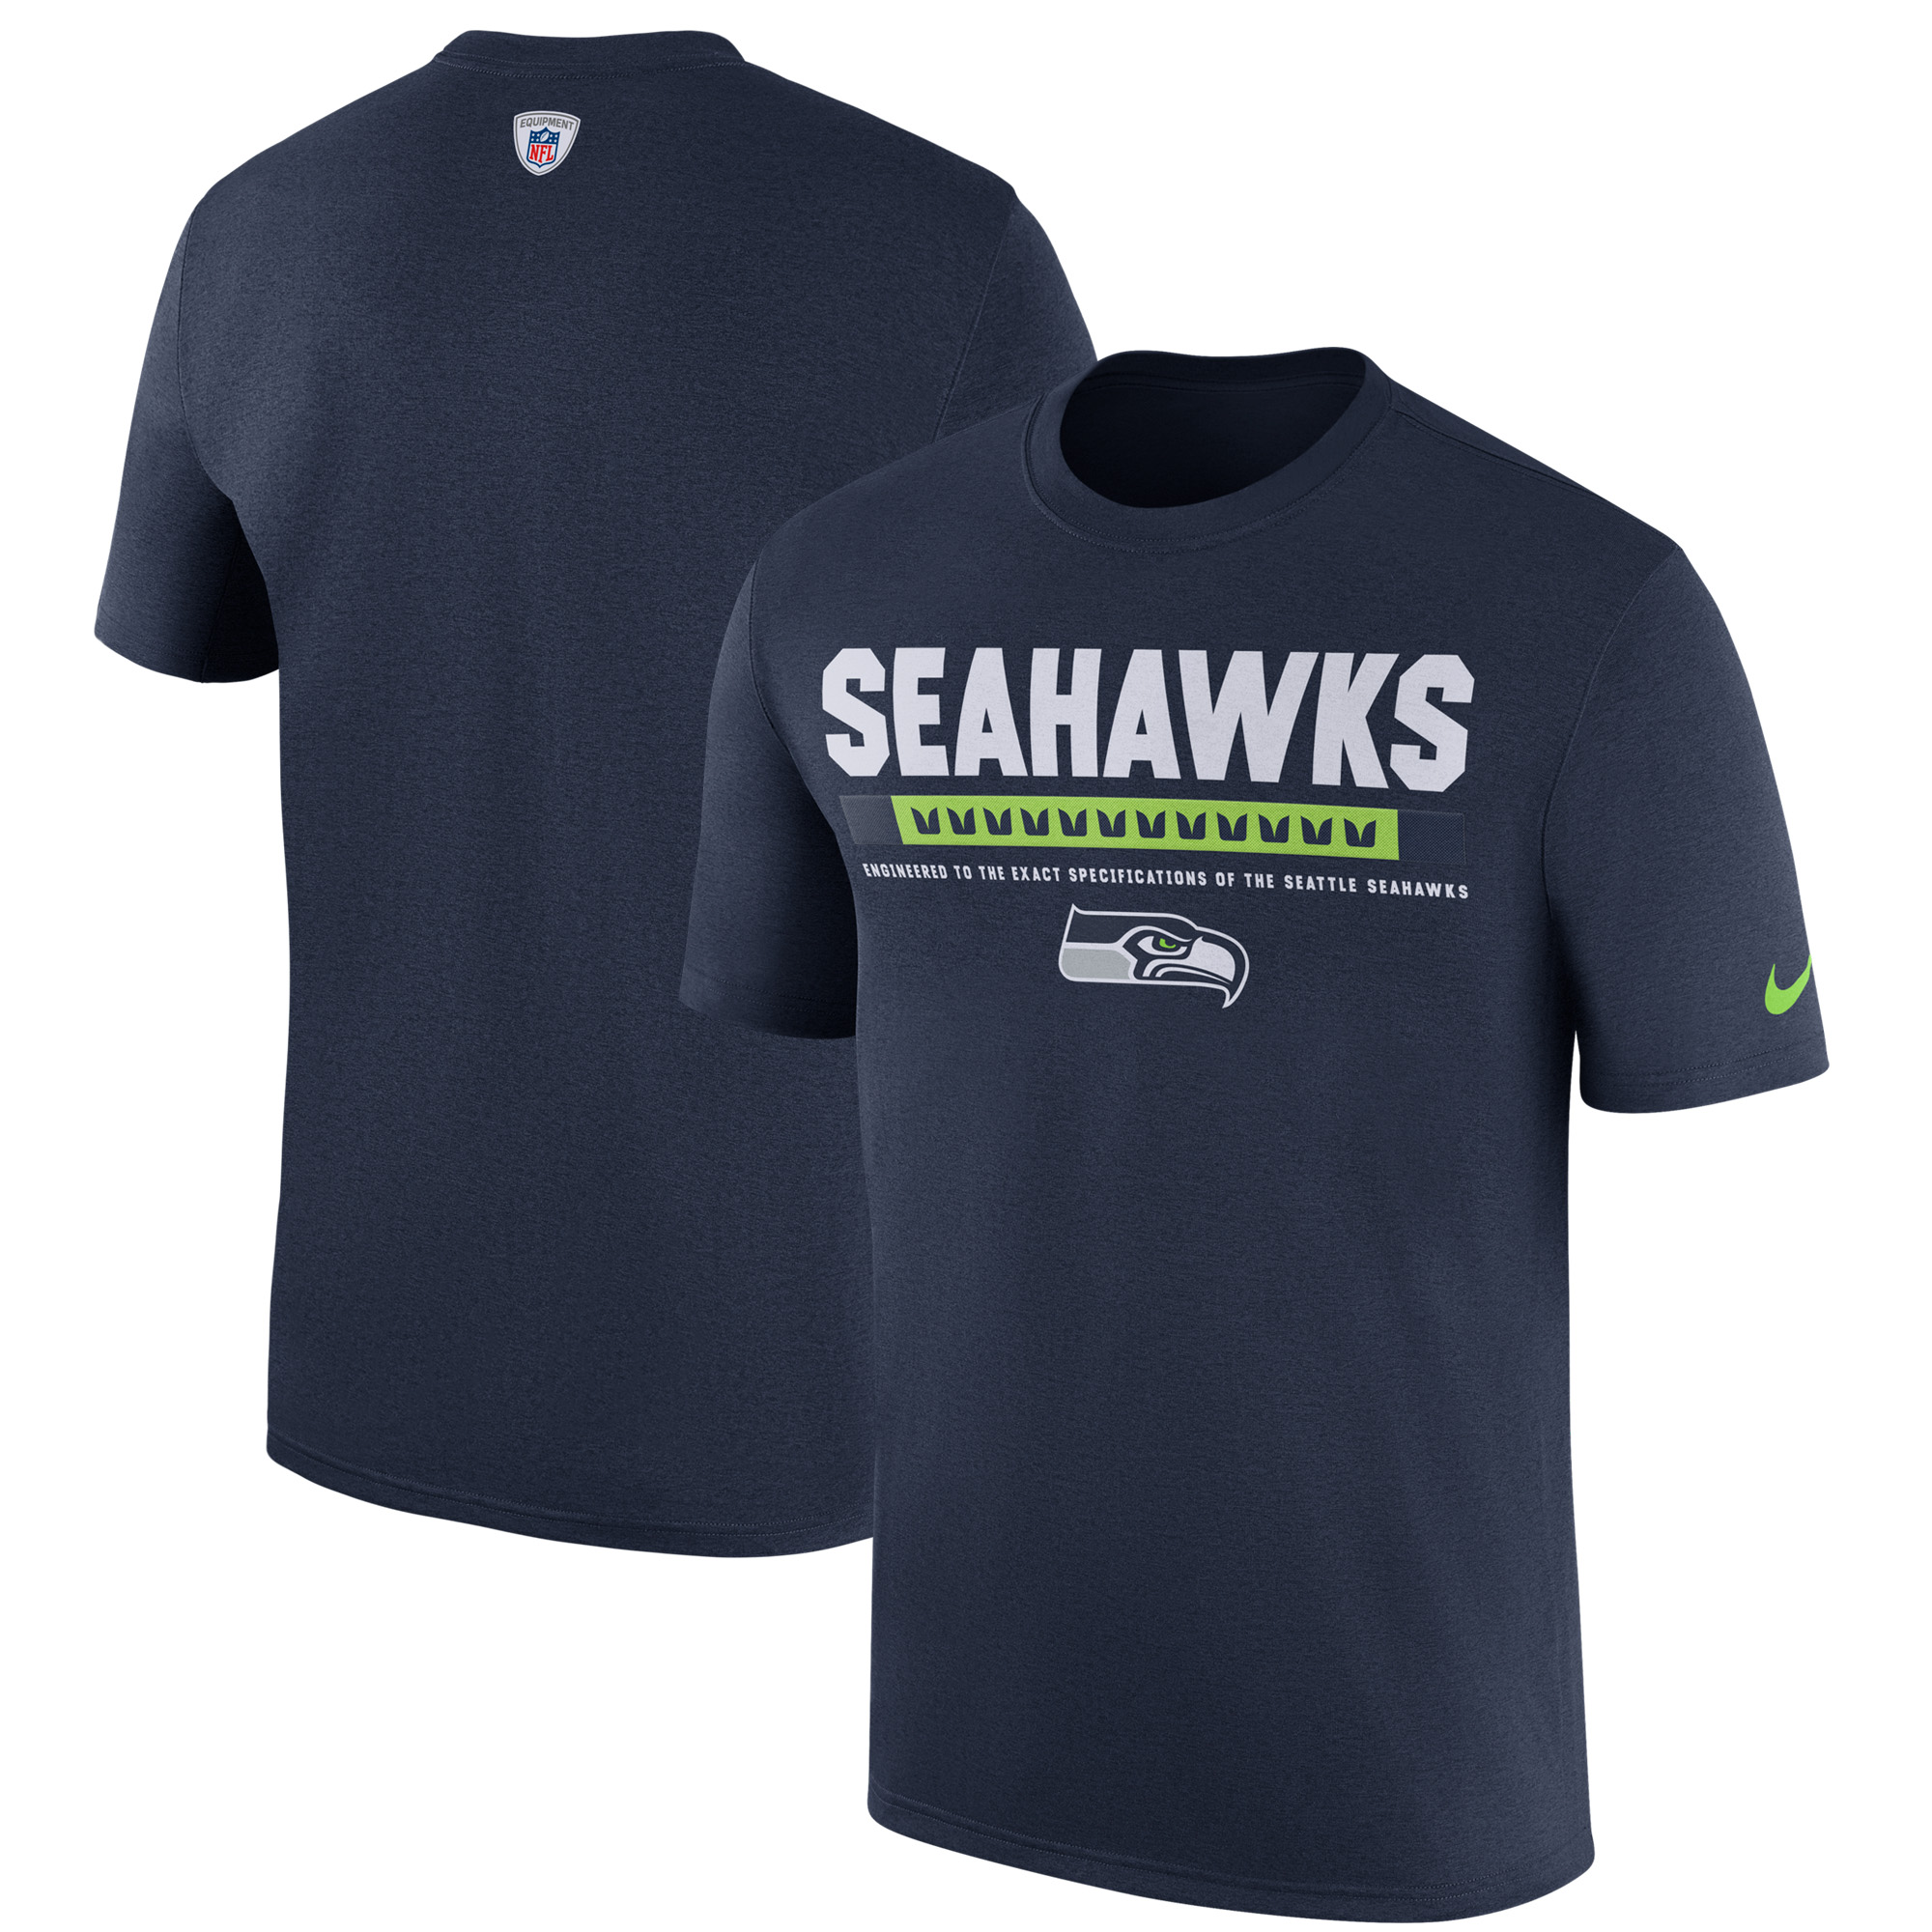 71c707b4697 Seattle Seahawks Nike Sideline Legend Staff Performance T-Shirt - College  Navy - Walmart.com